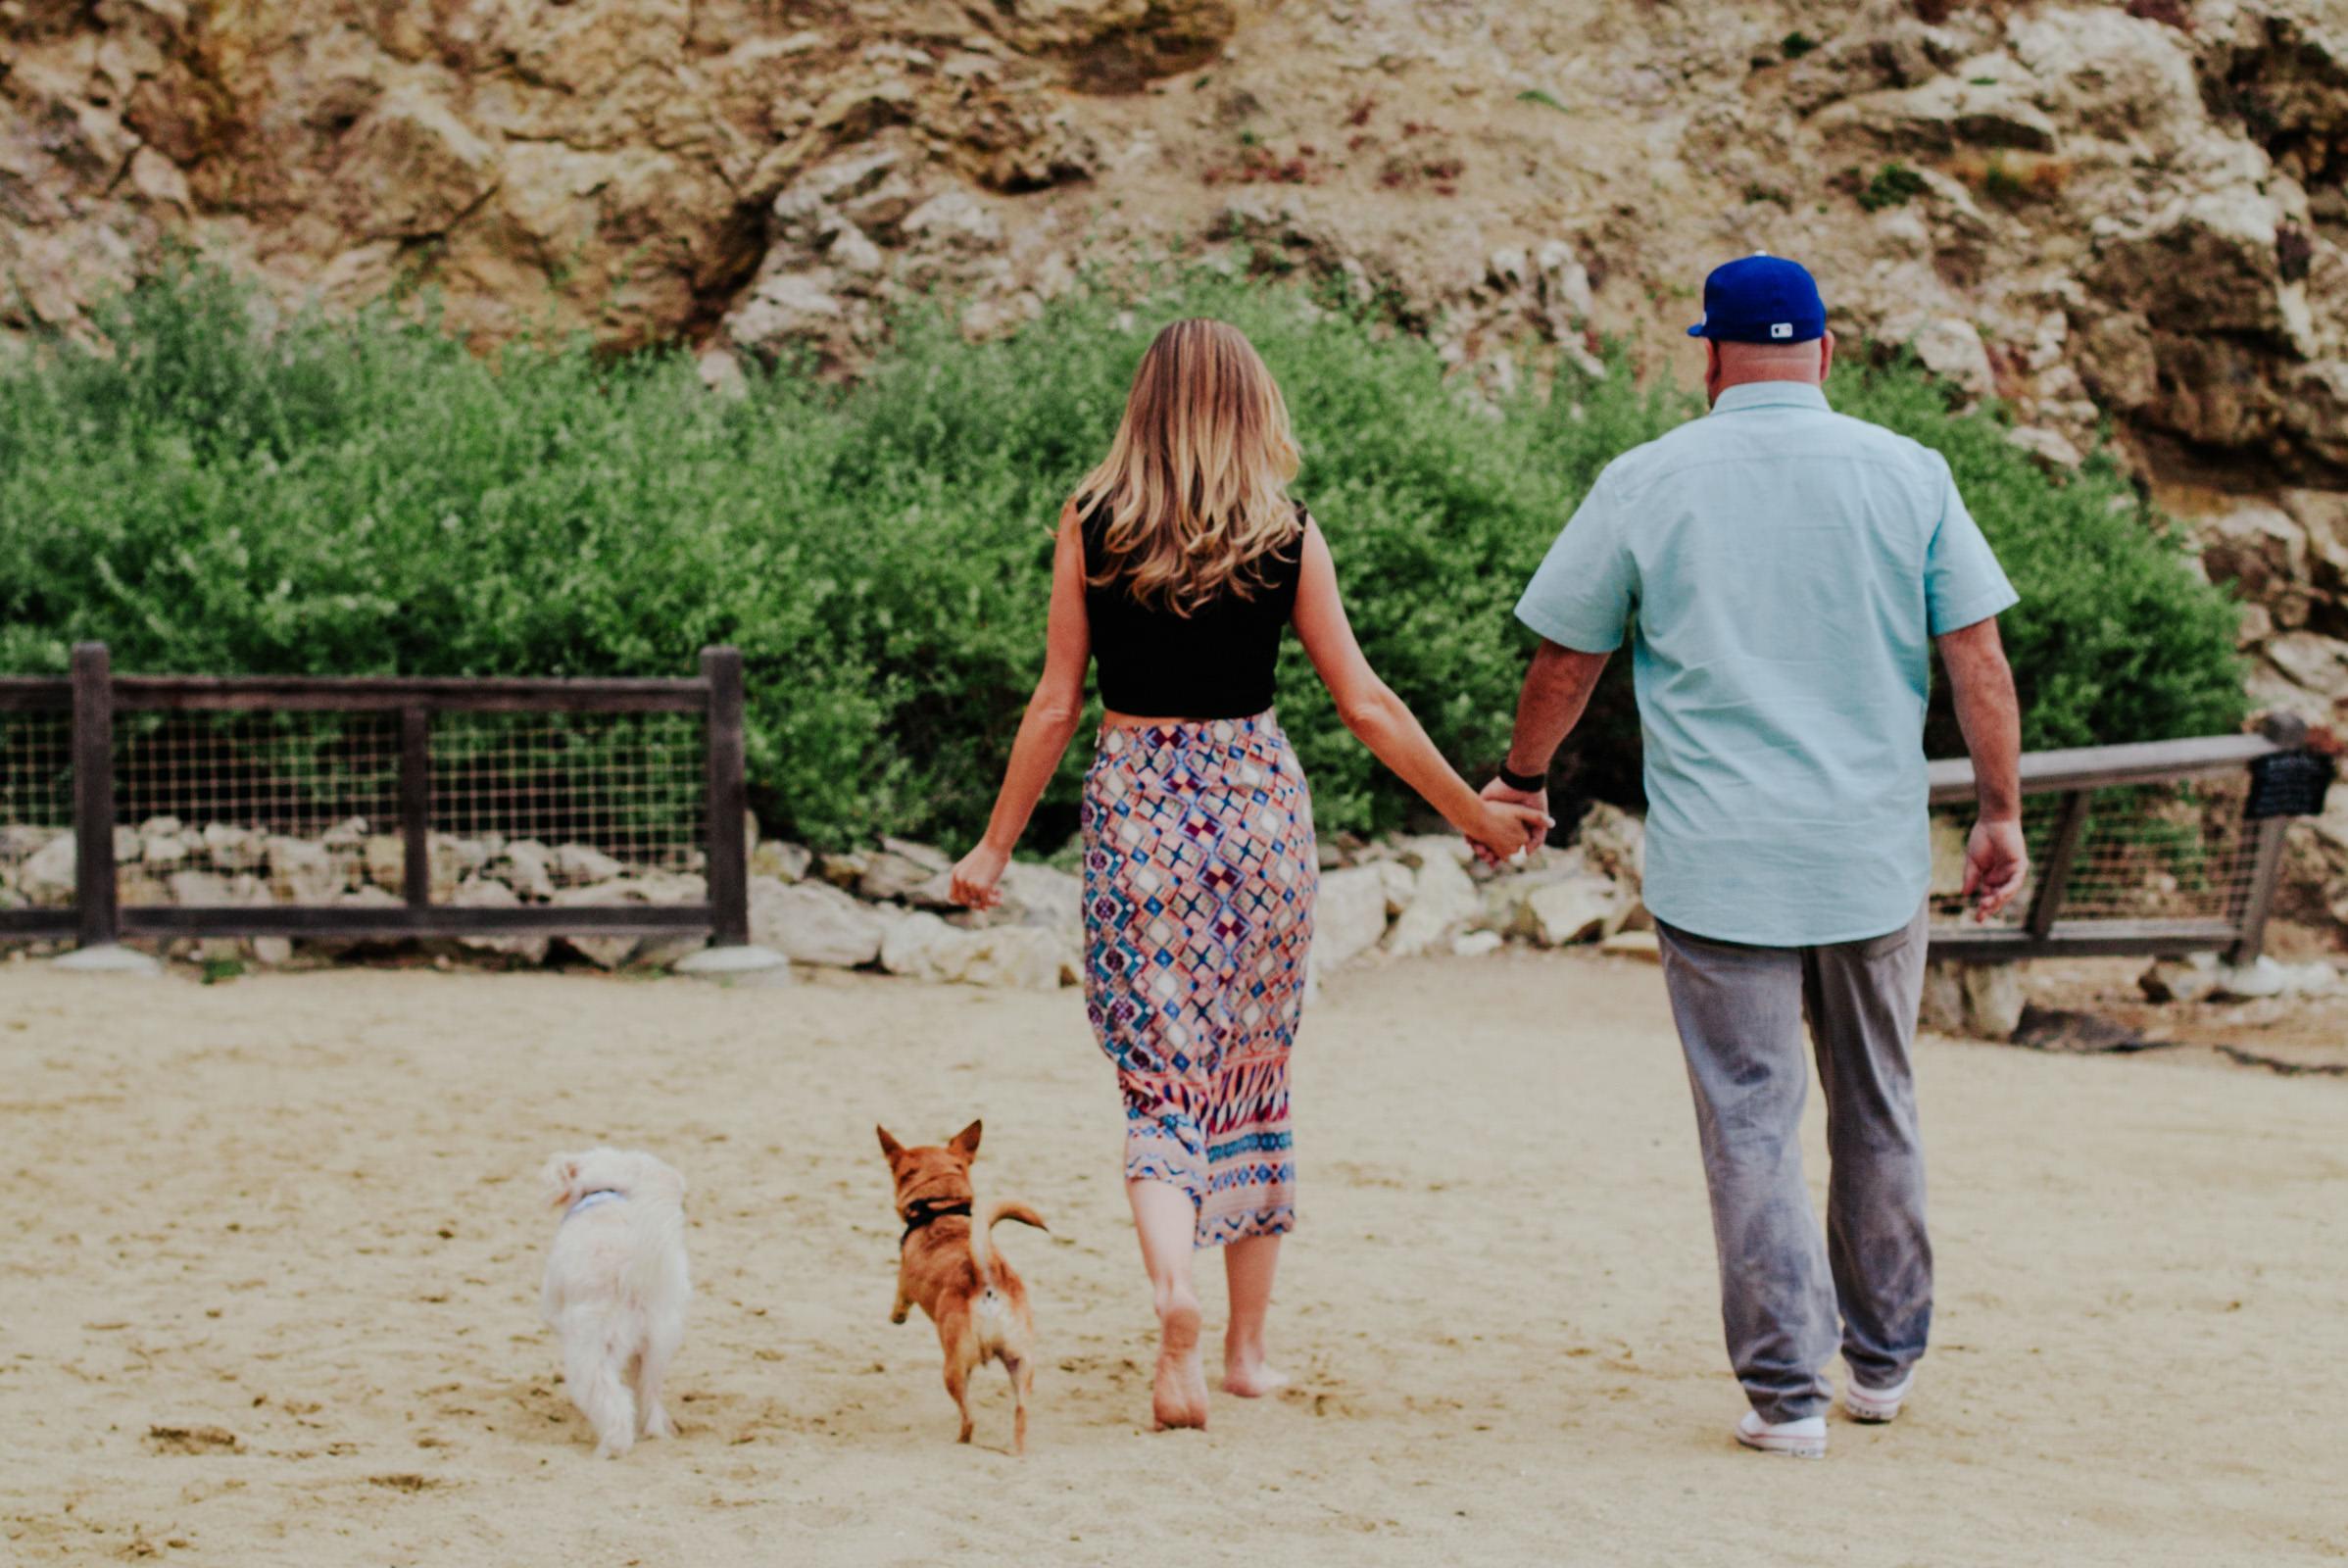 terranea-resort-palos-verdes-california-wedding-photography-cove-los-angeles-pierce-135.jpg